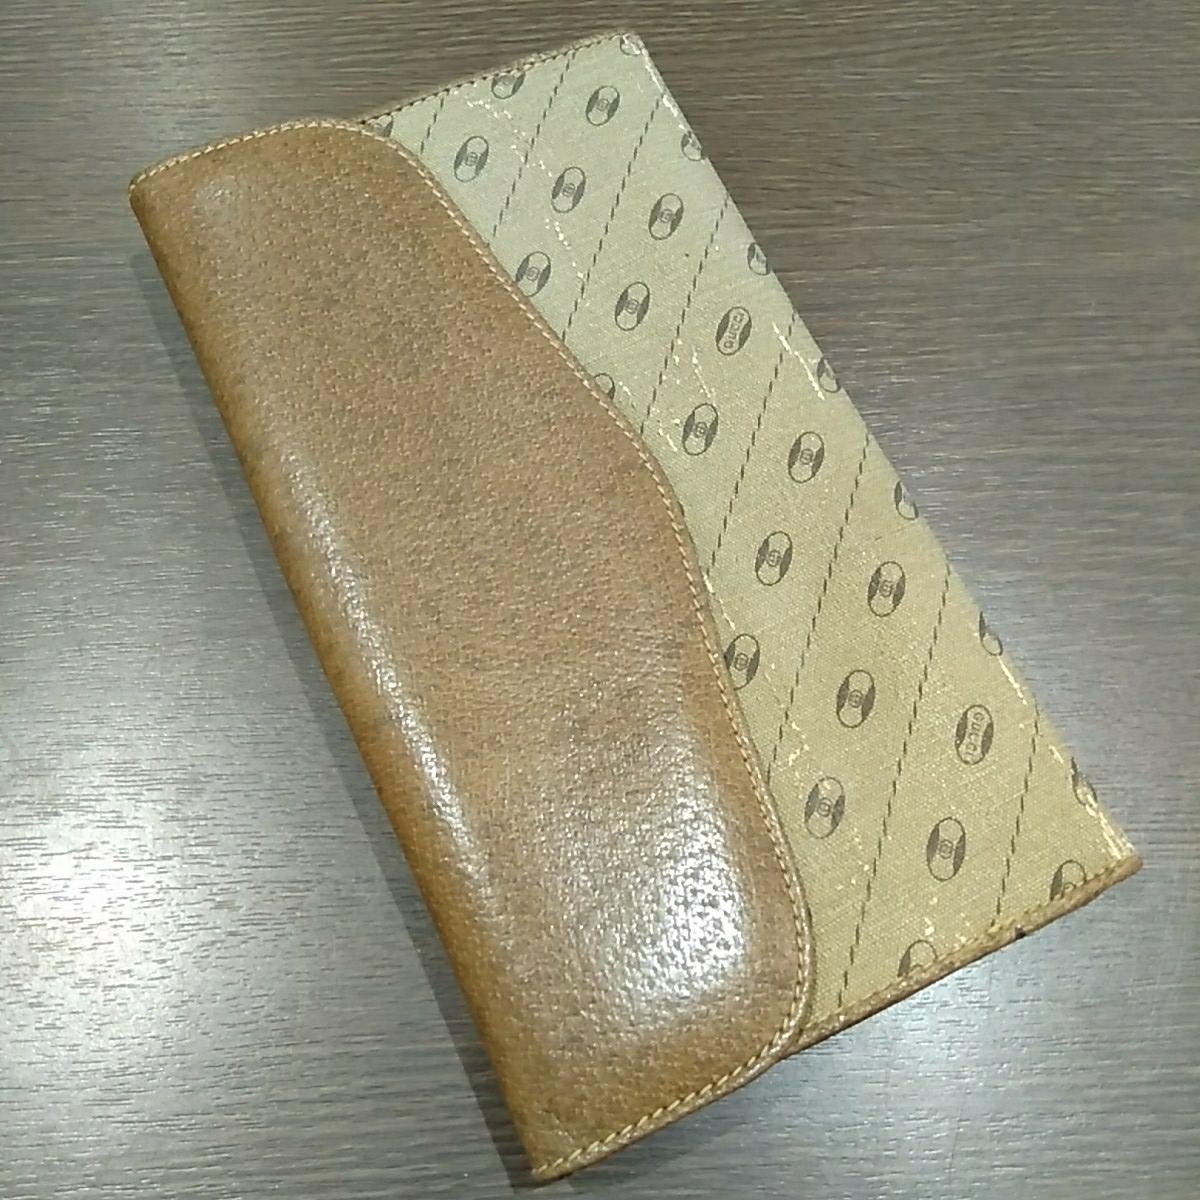 wholesale dealer d1d8b 6572d 代購代標第一品牌- 樂淘letao - GUCCI グッチ長財布ブラウン ...